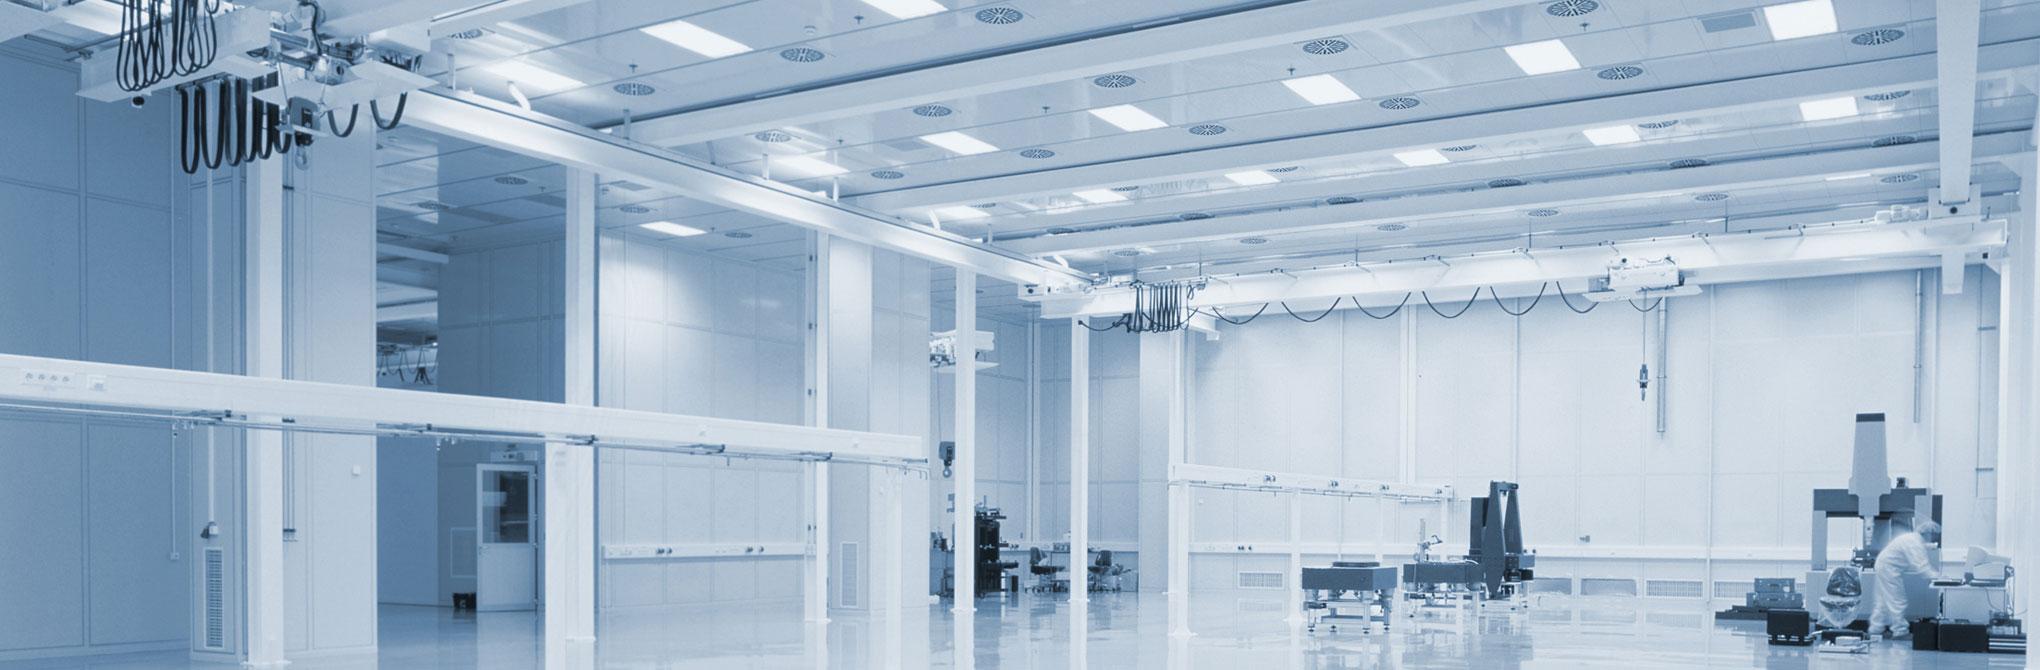 Ridgewood Electrical Maintenance | Wiring Updates | Landscape Lighting